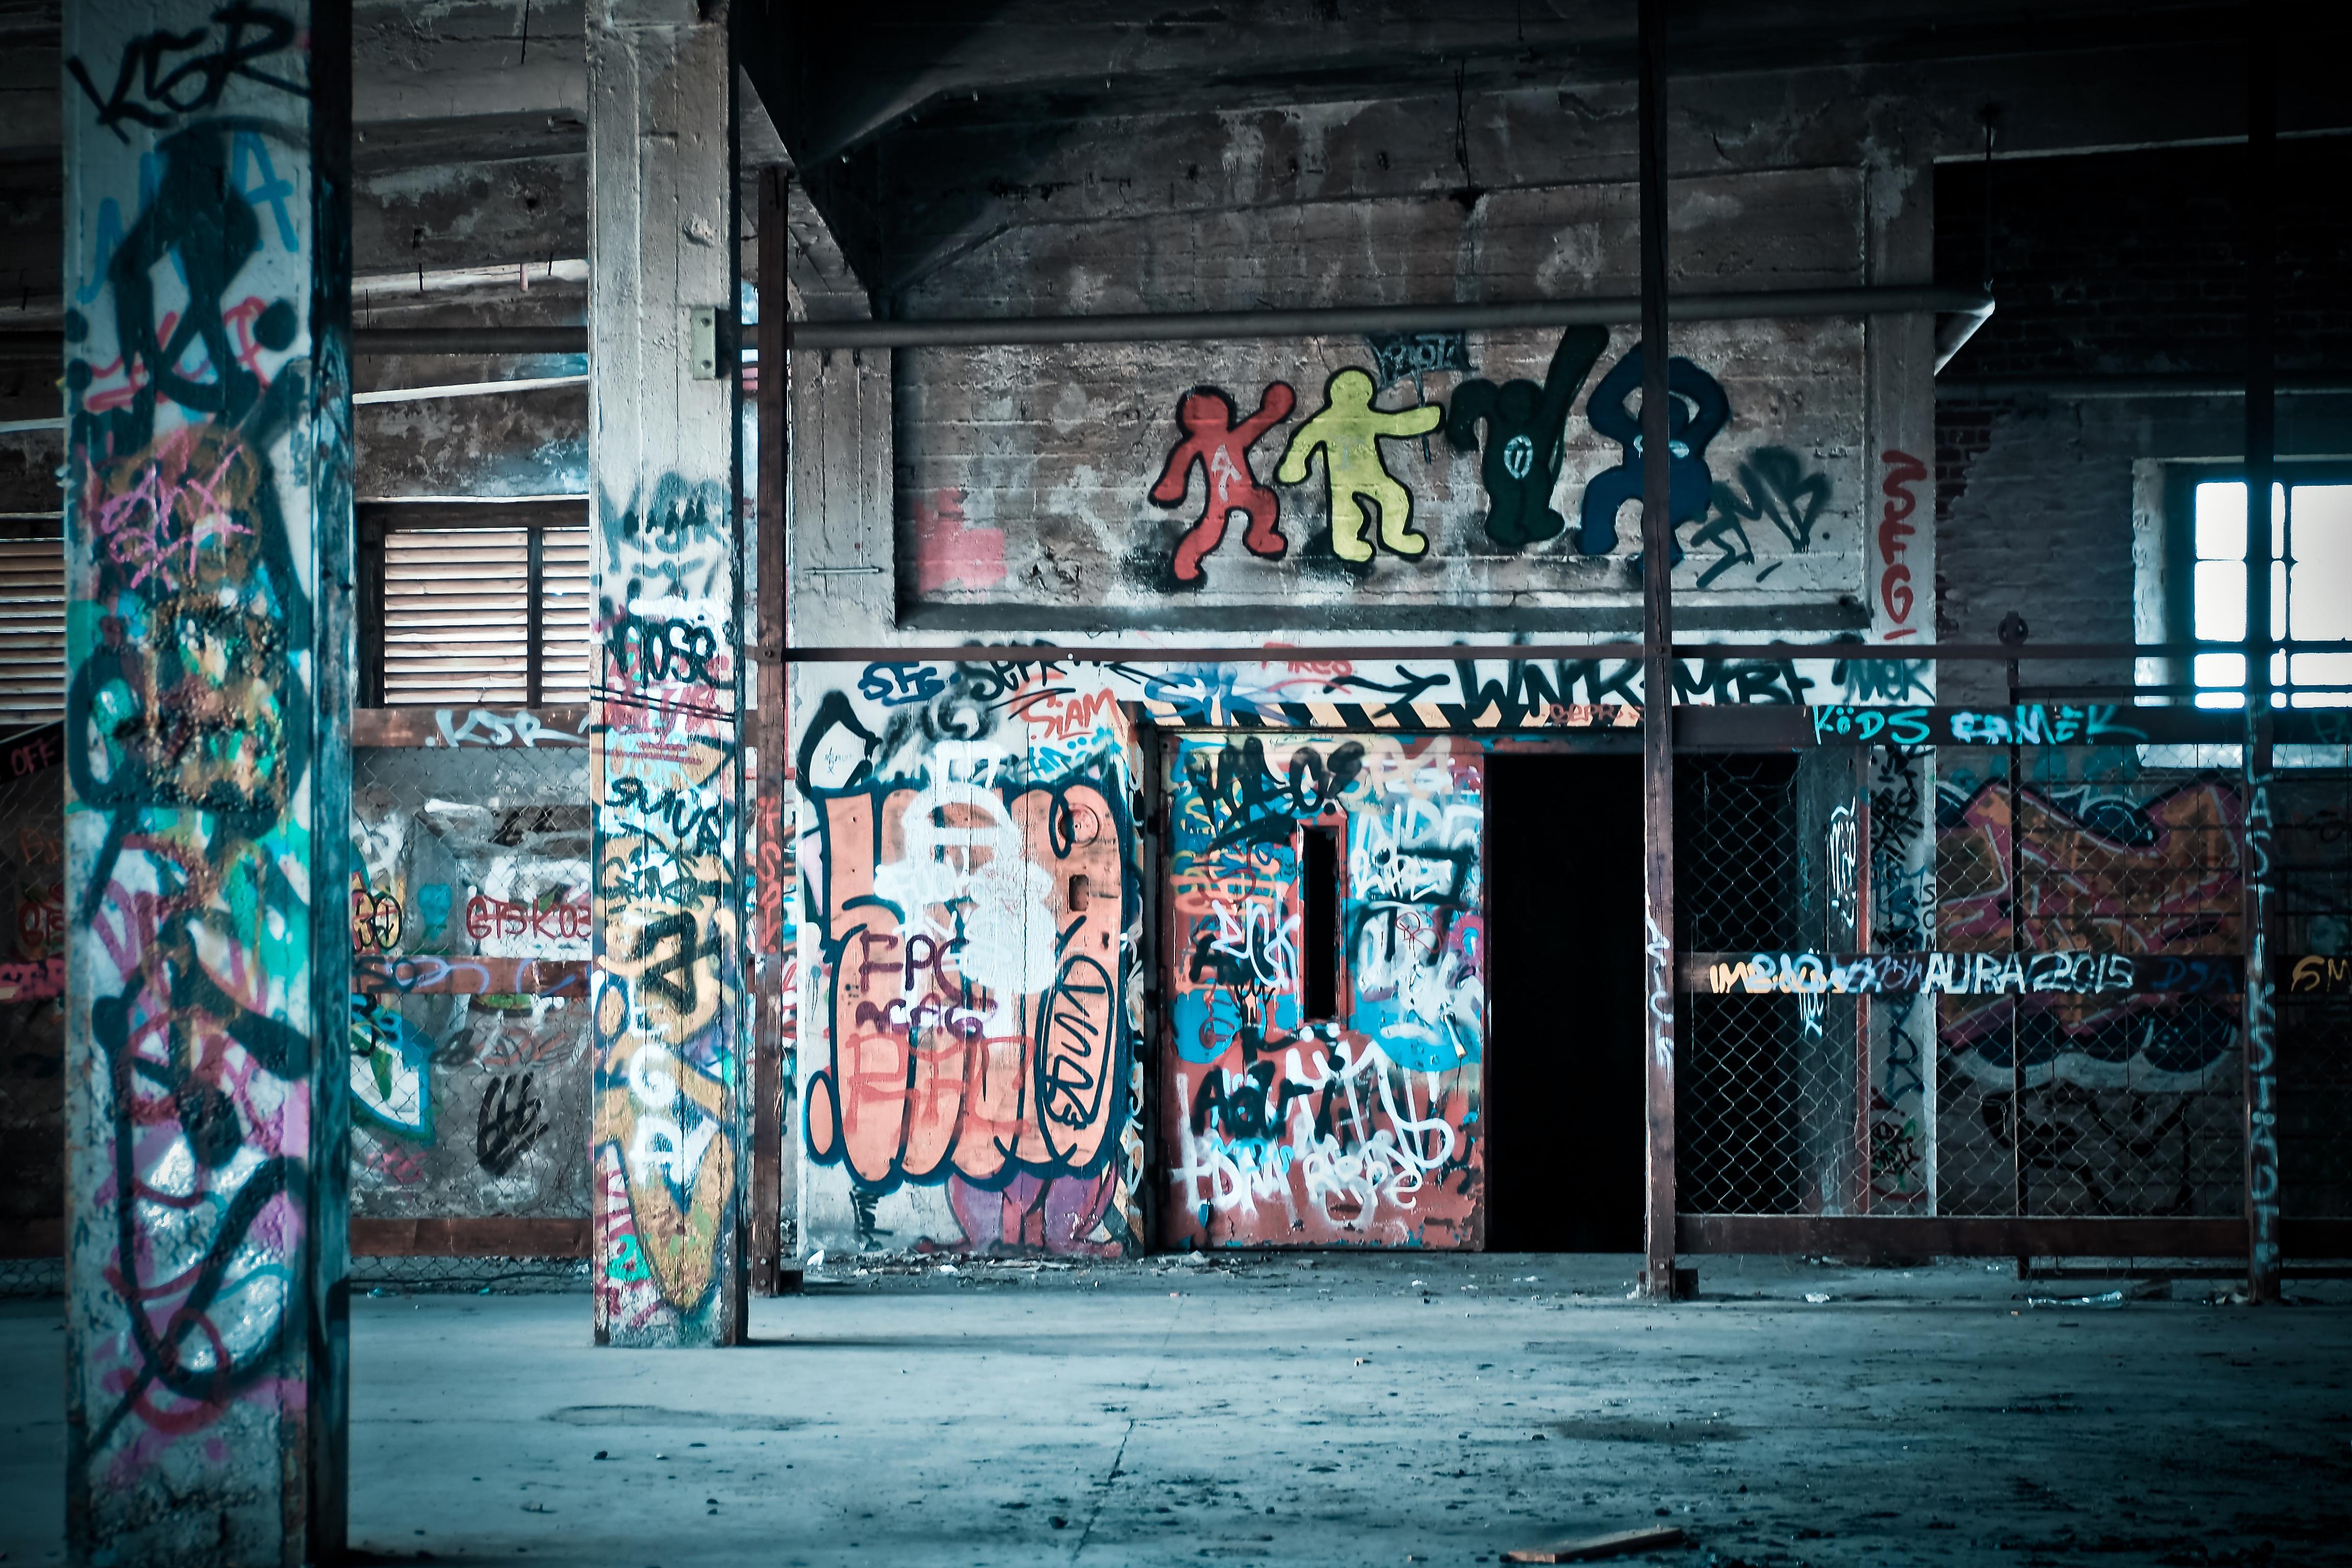 Road street building wall color abandoned graffiti painting street art art vandalism infrastructure dilapidated metropolis urban